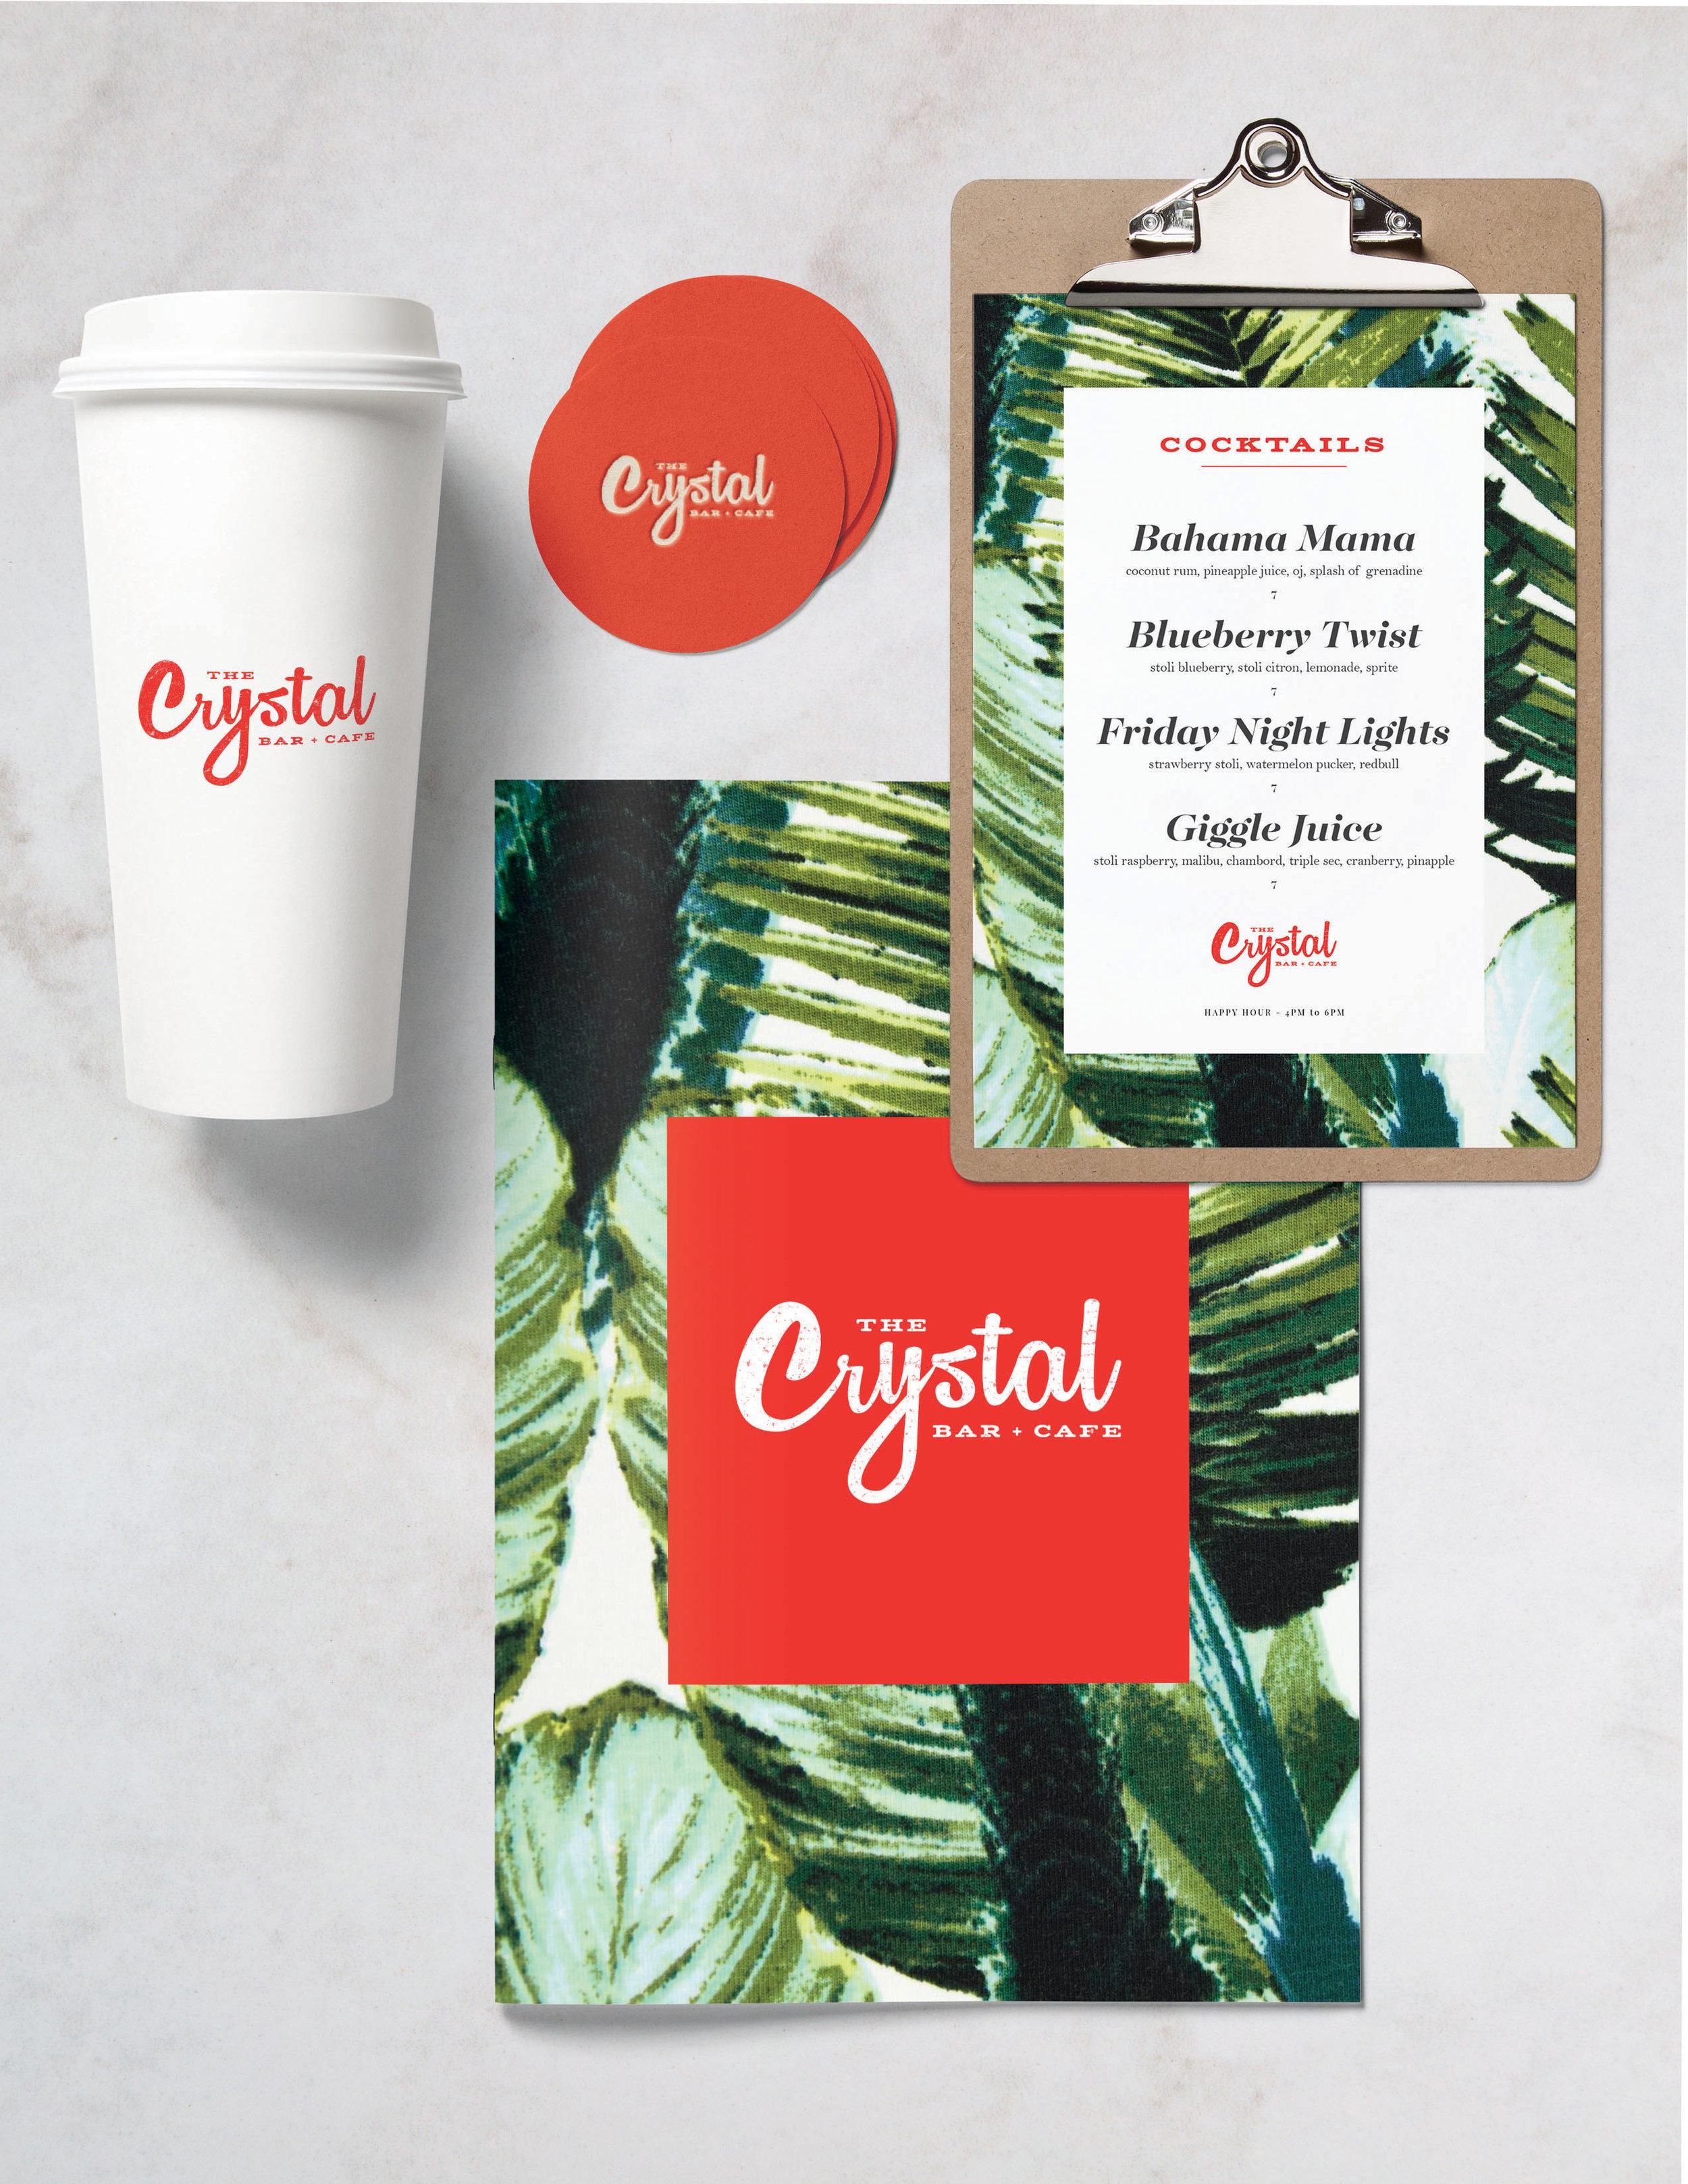 Crystalbar.jpg